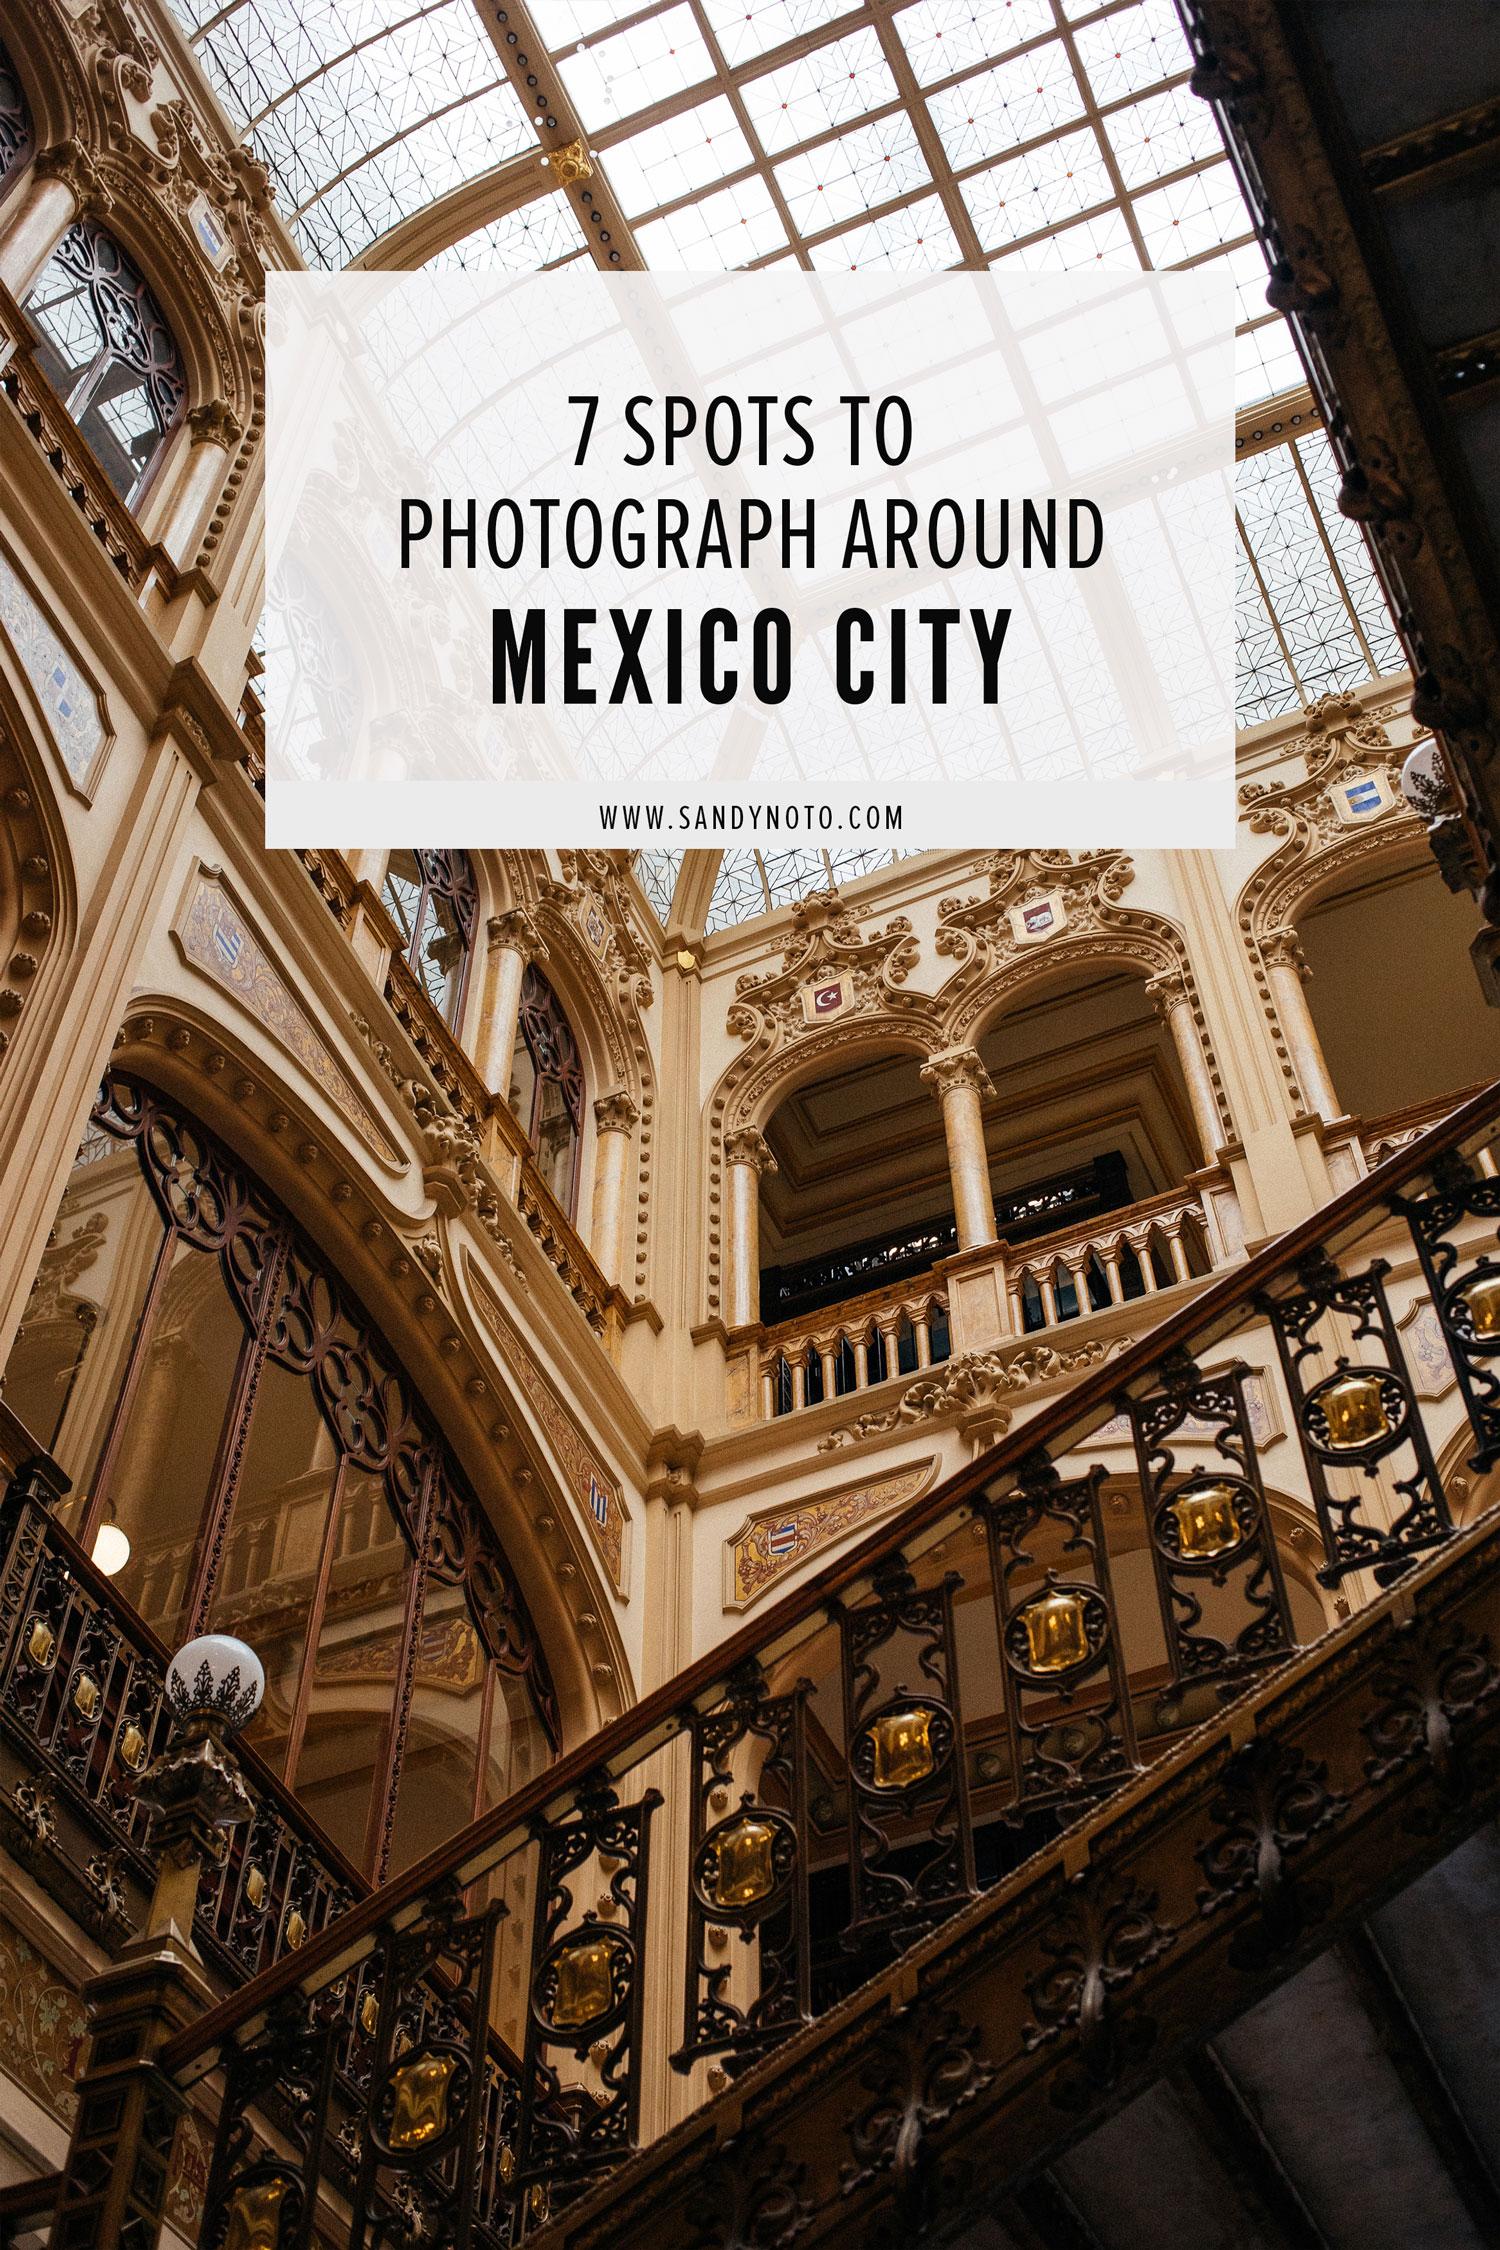 7 spots to photograph around Mexico City